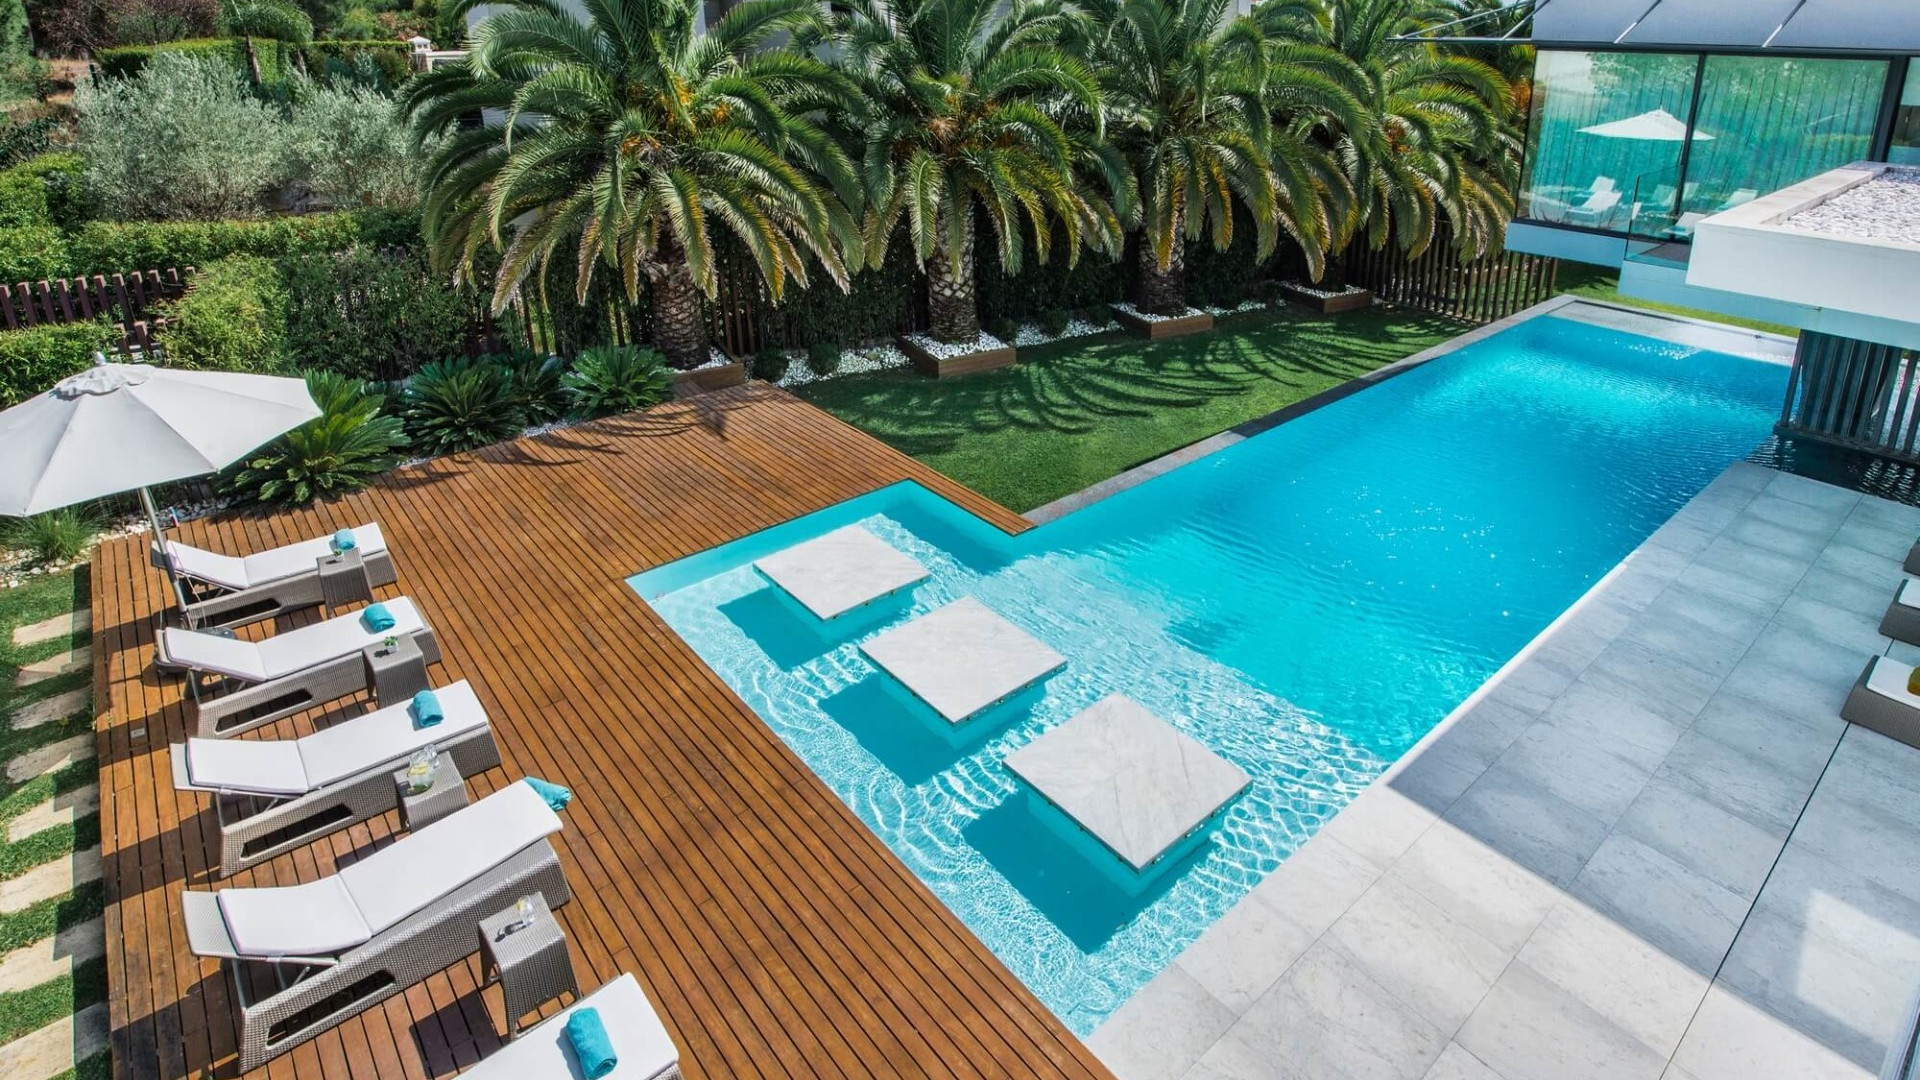 Luxury 4 Bedroom Villa Quinta Verde Heated Pool & Roof Terrace With Jacuzzi